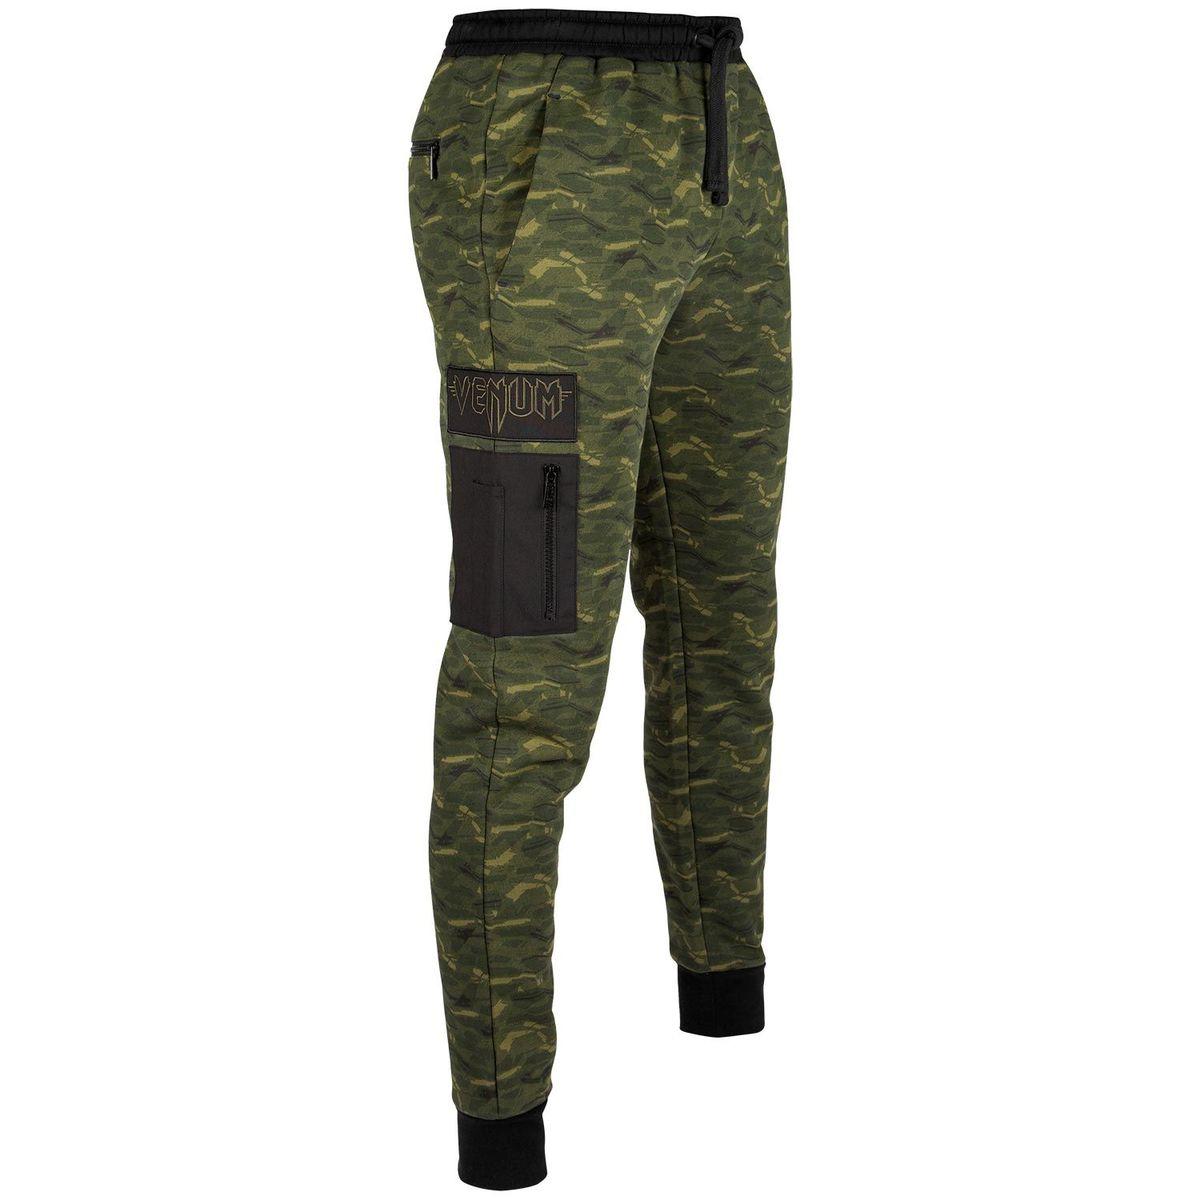 626a7b0619b kalhoty pánské (tepláky) VENUM - Tramo - Khaki - VENUM-03606-015 ...